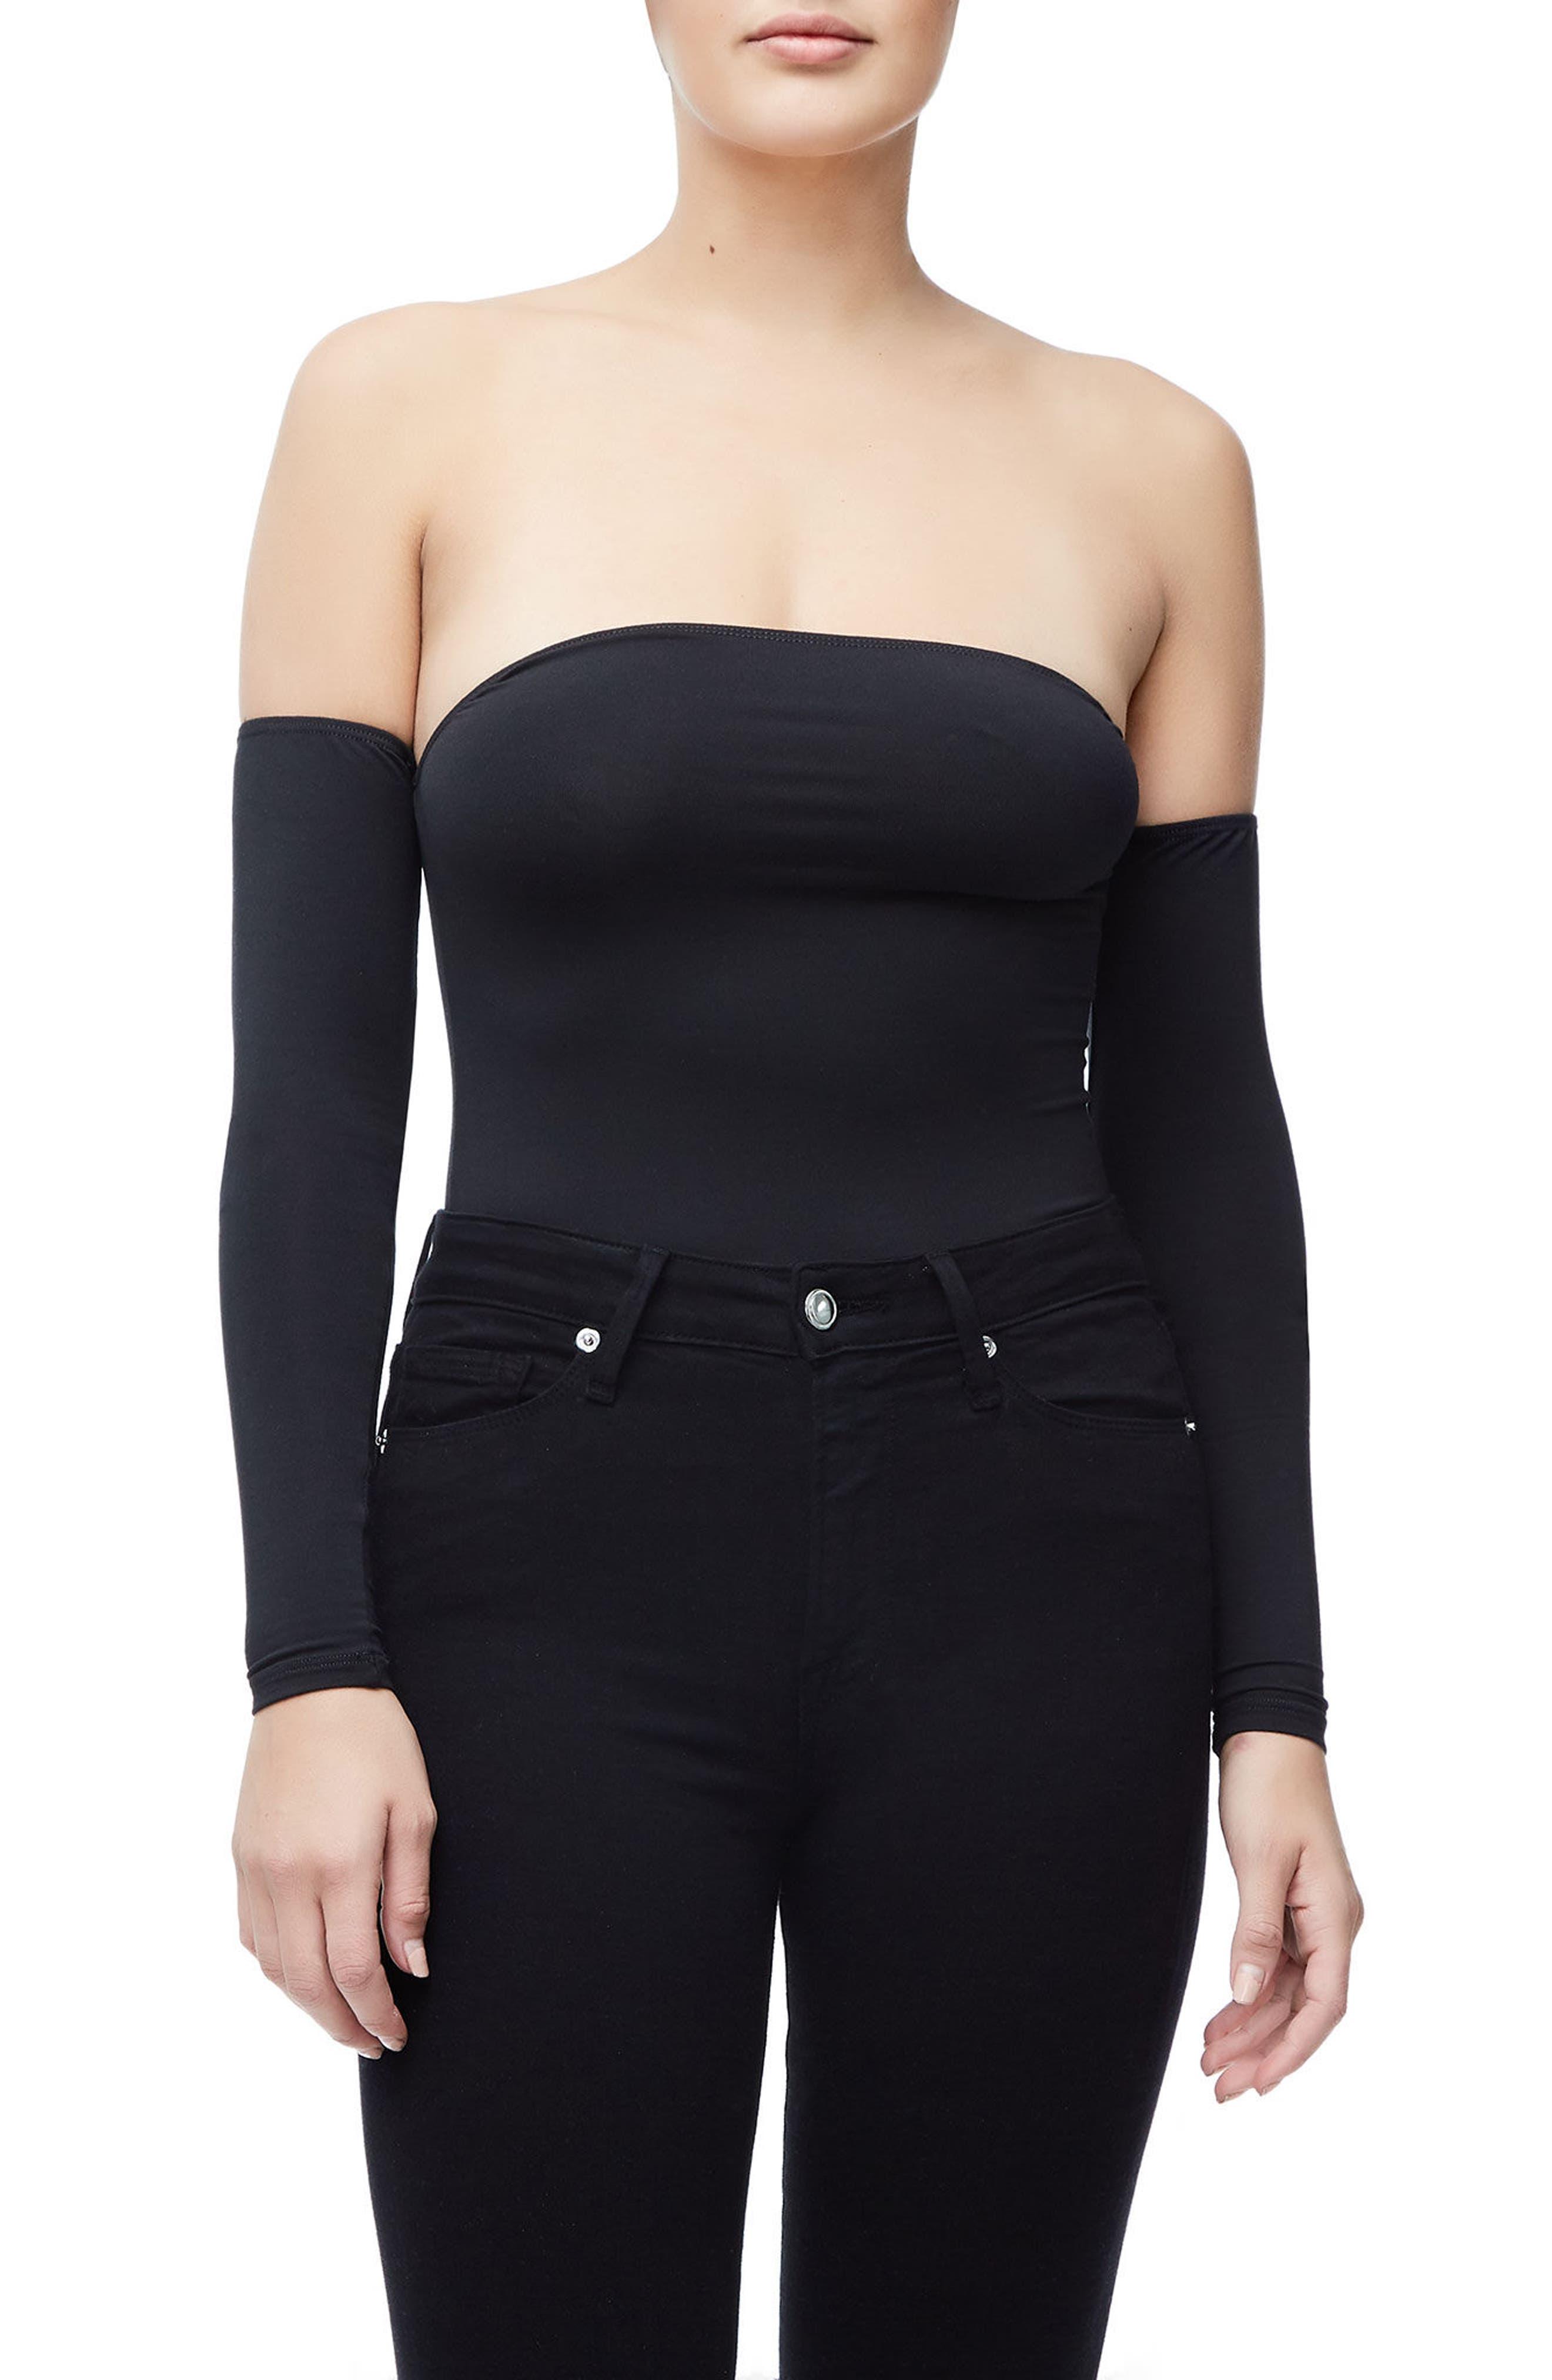 Good Body Sporty Off the Shoulder Thong Bodysuit,                             Alternate thumbnail 2, color,                             Black001